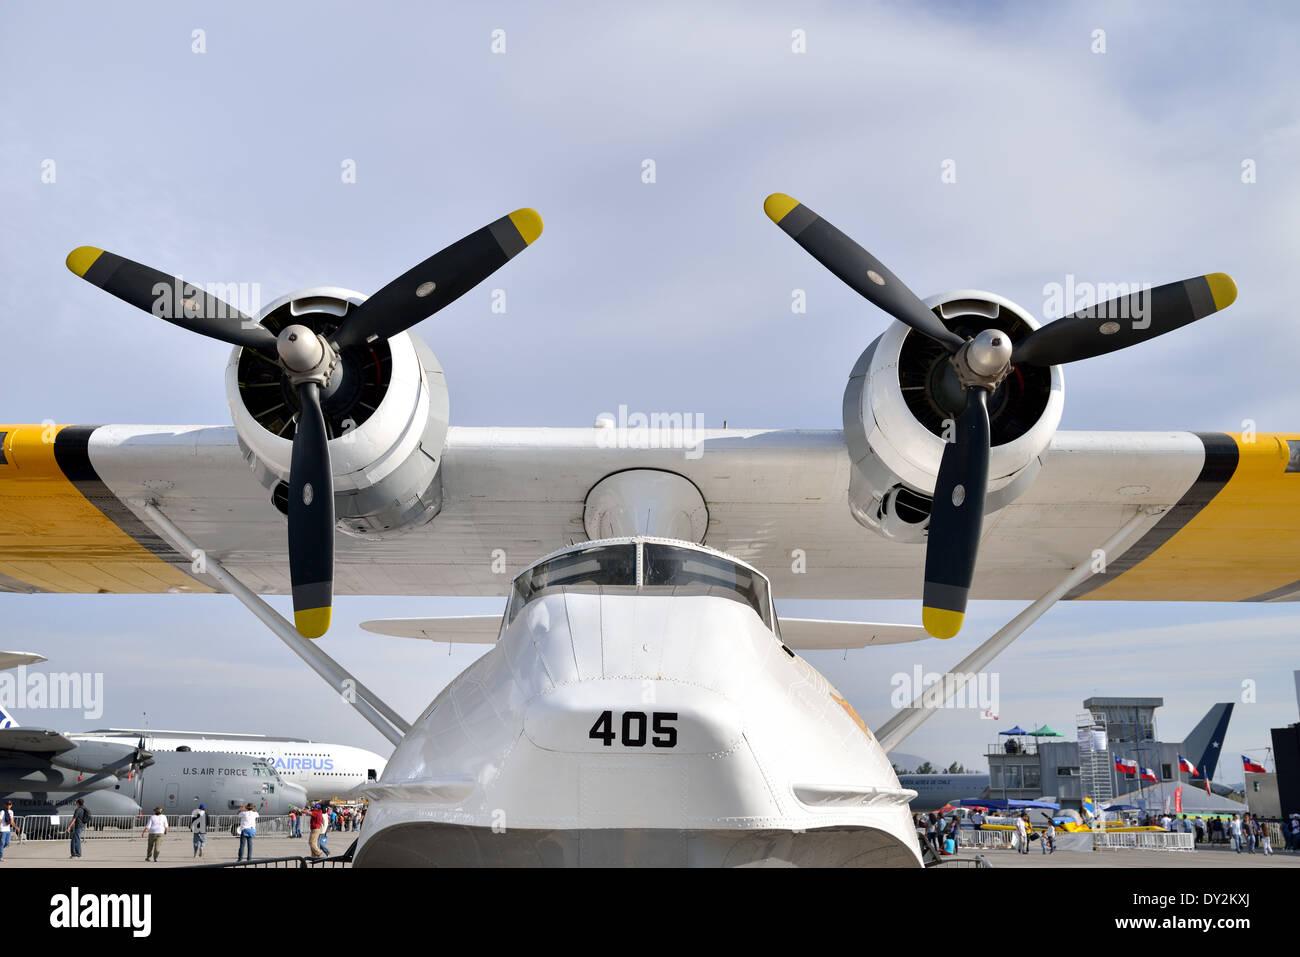 PBY Catalina flying boat FACH No. 405 called 'Manu-Tara' (Lucky Bird). - Stock Image